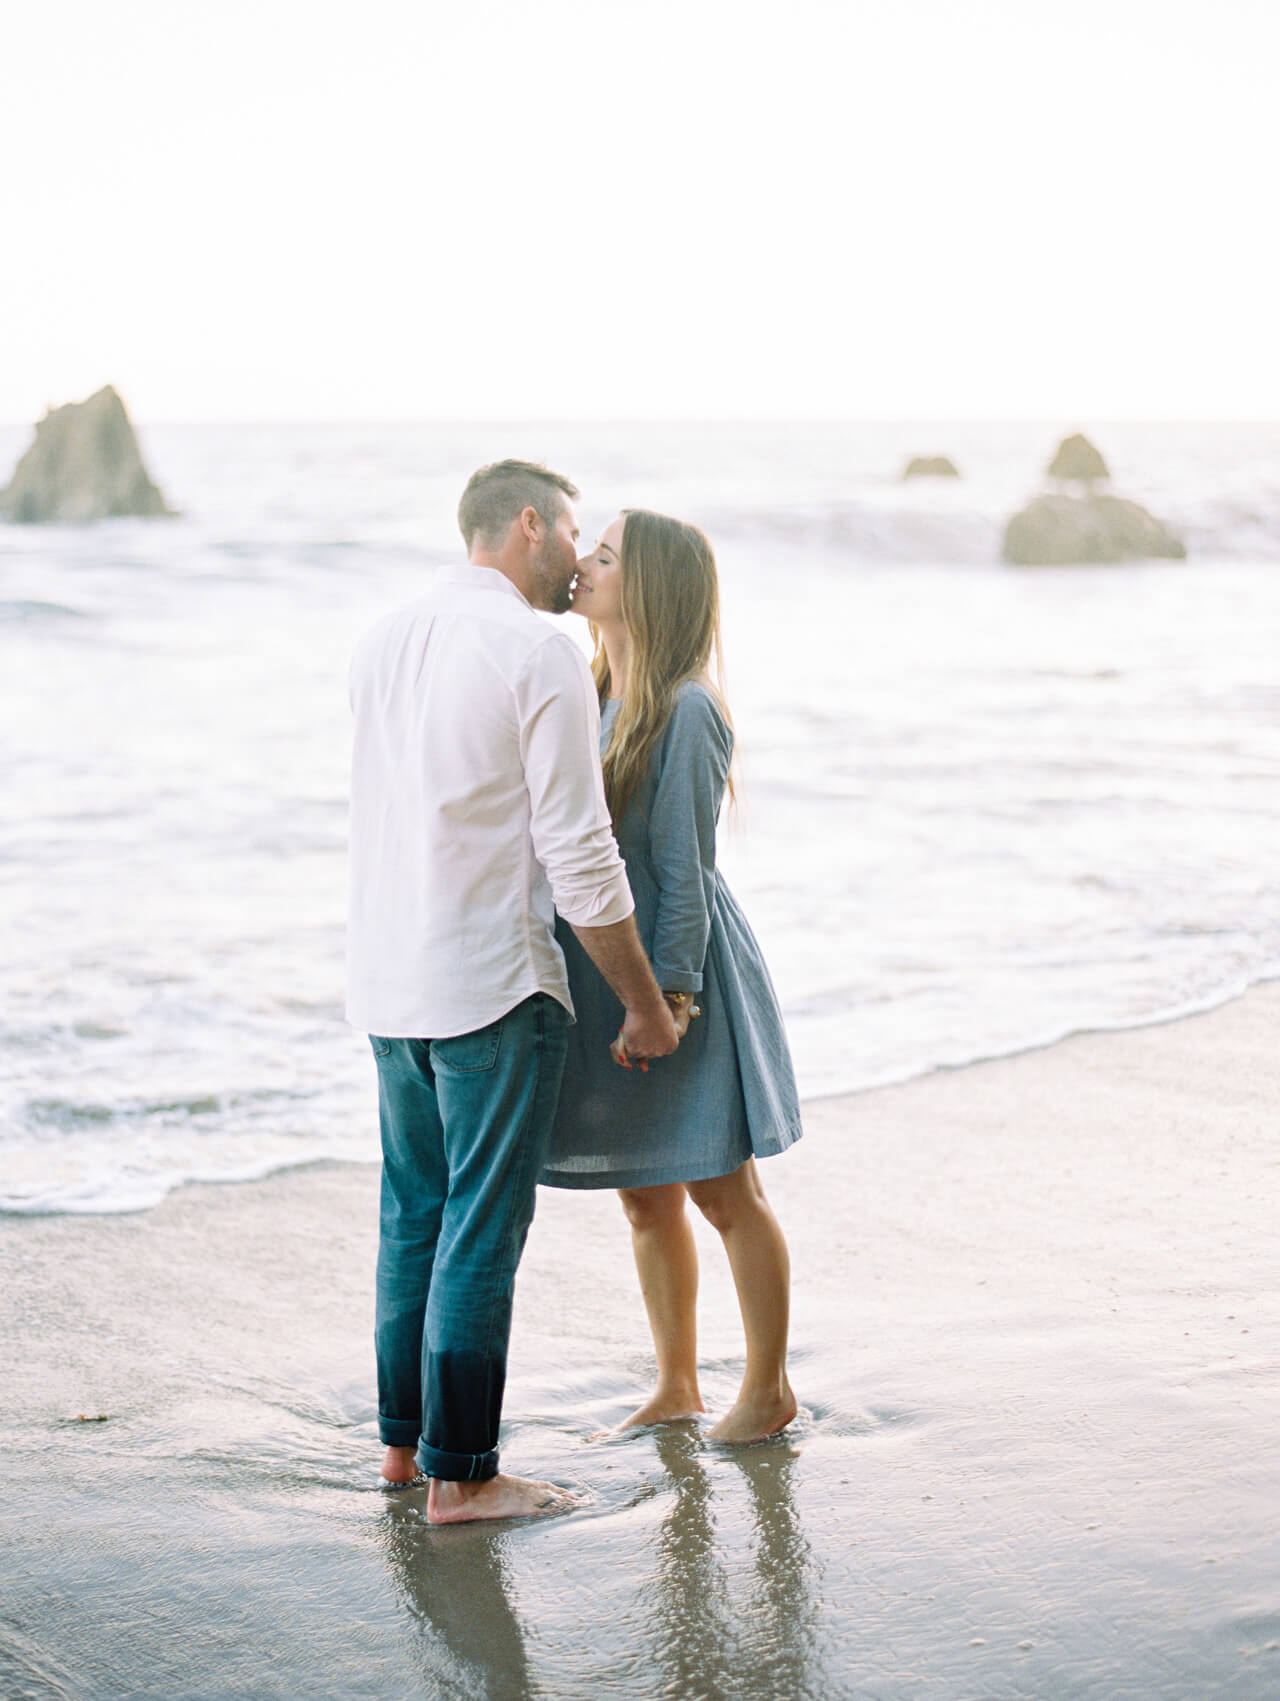 M Loves M couple shoot in Malibu